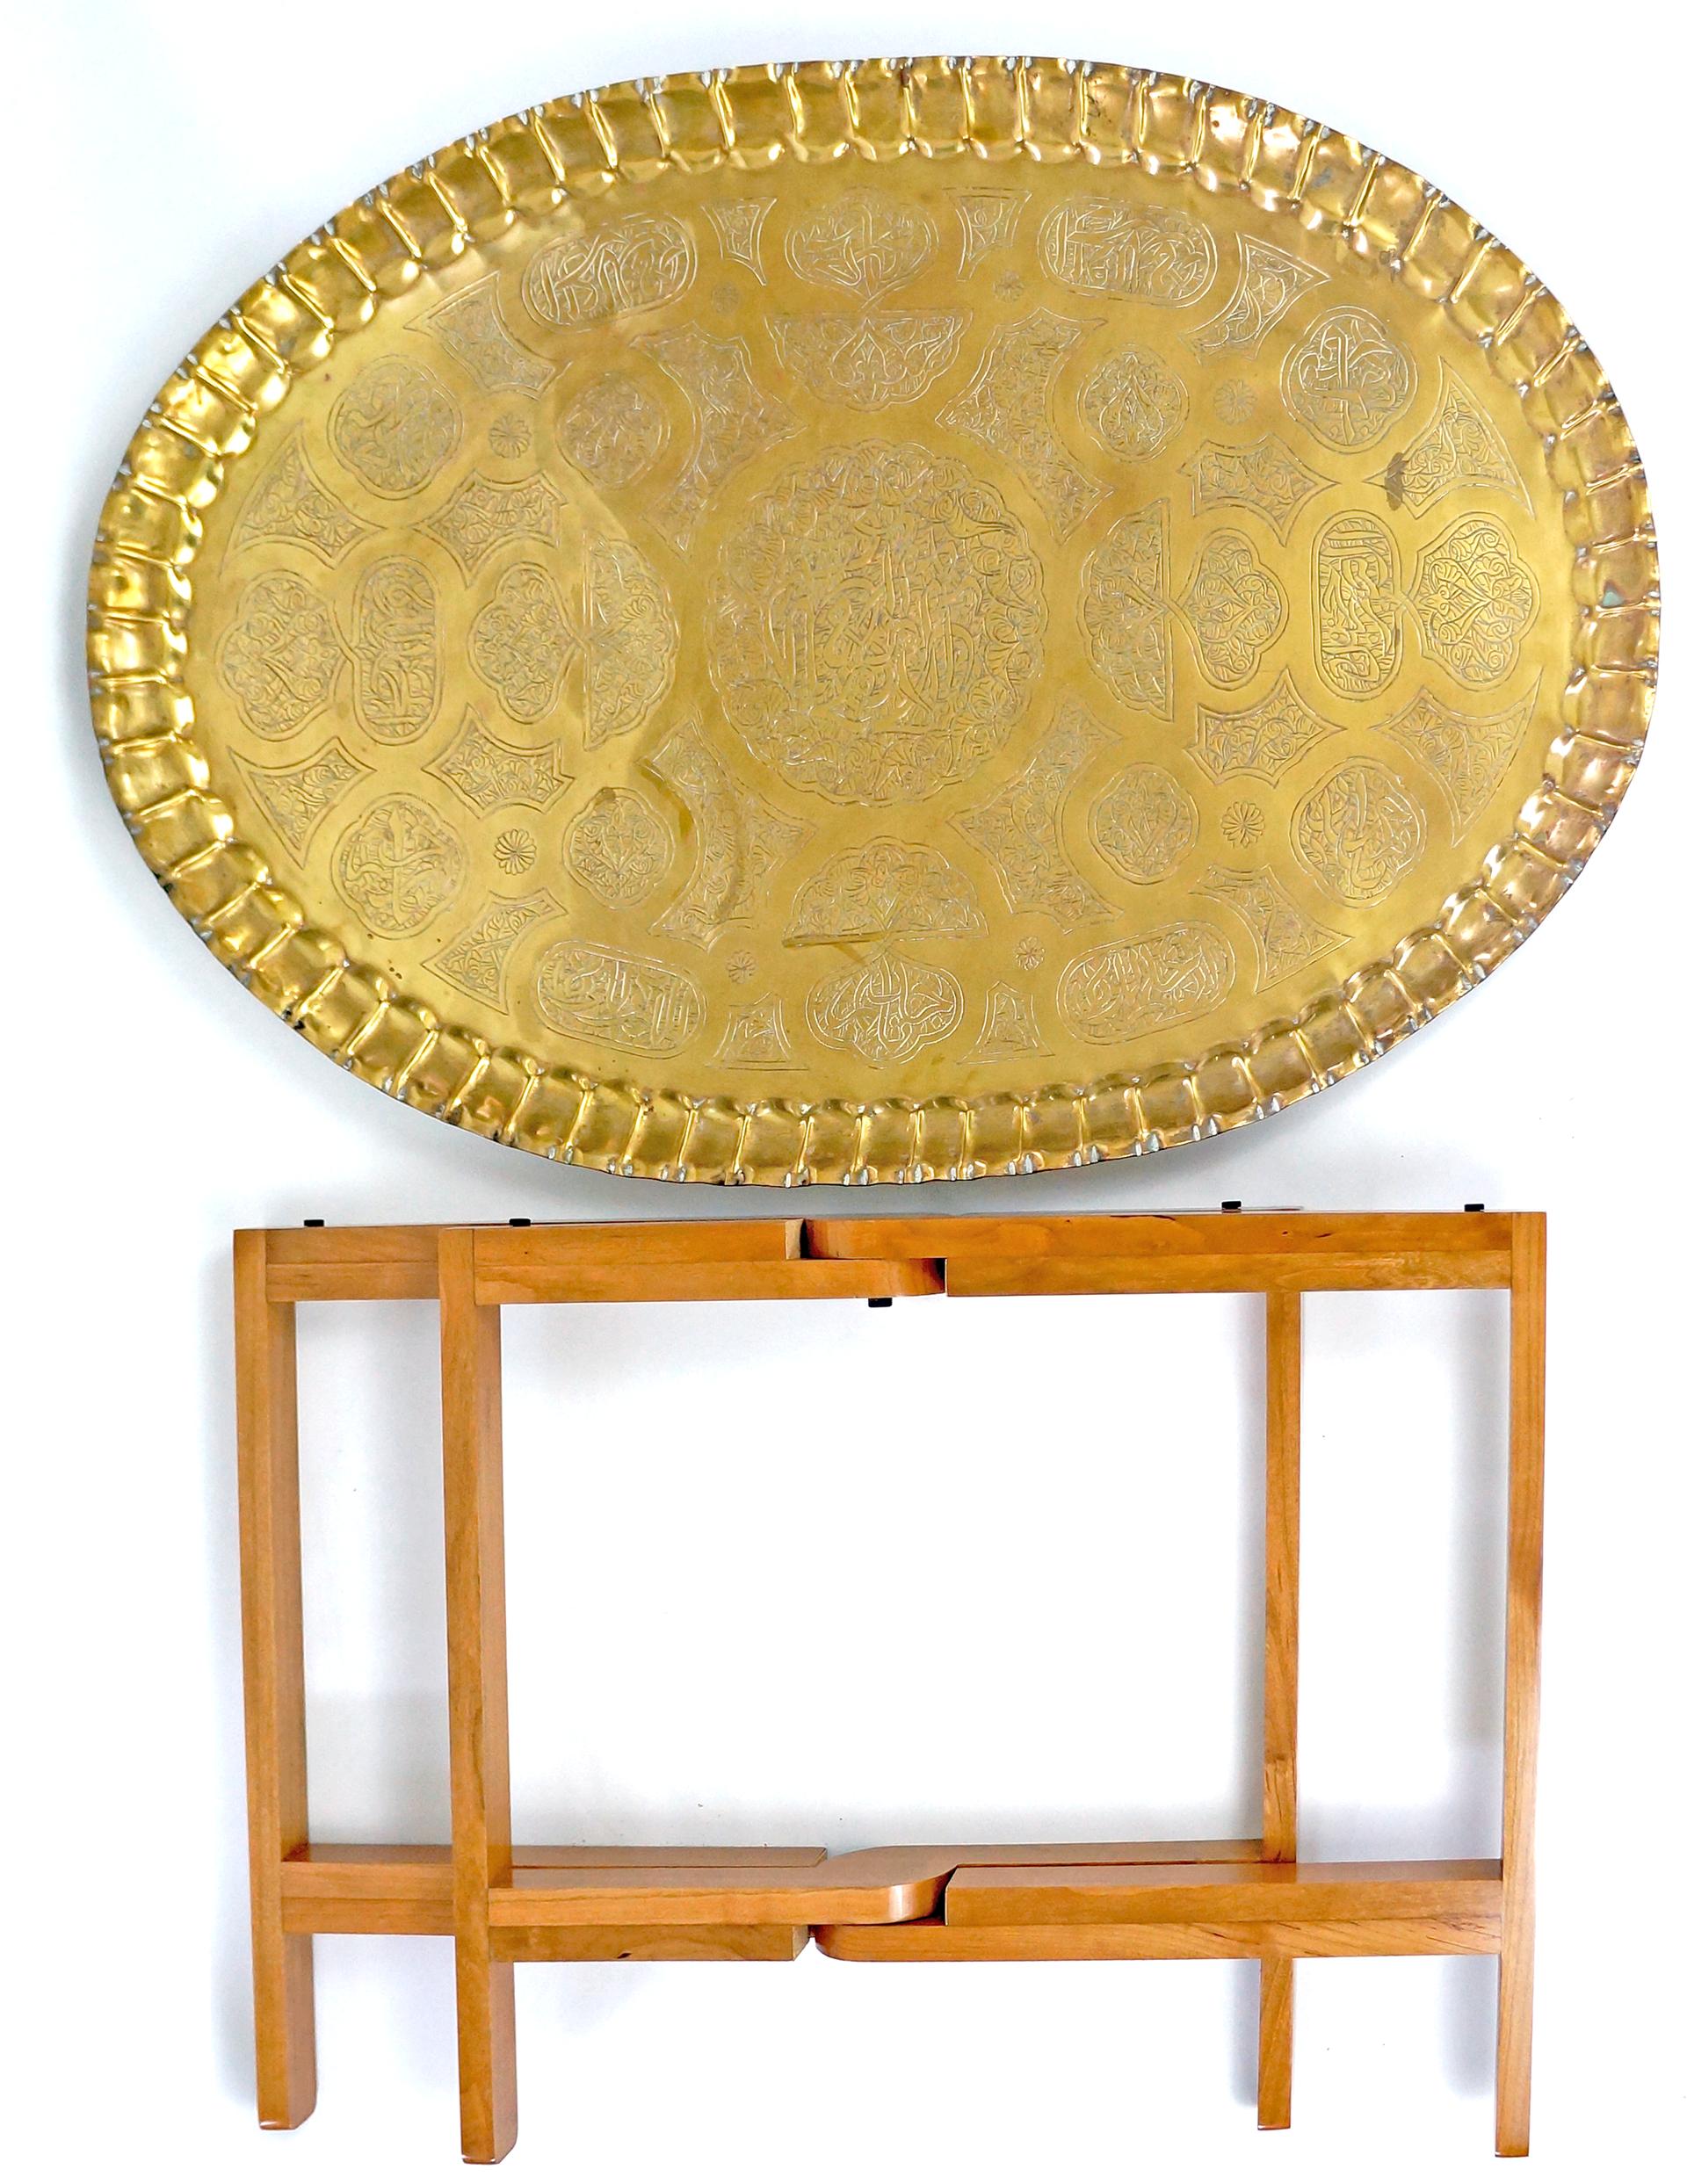 Folding table base 5.png